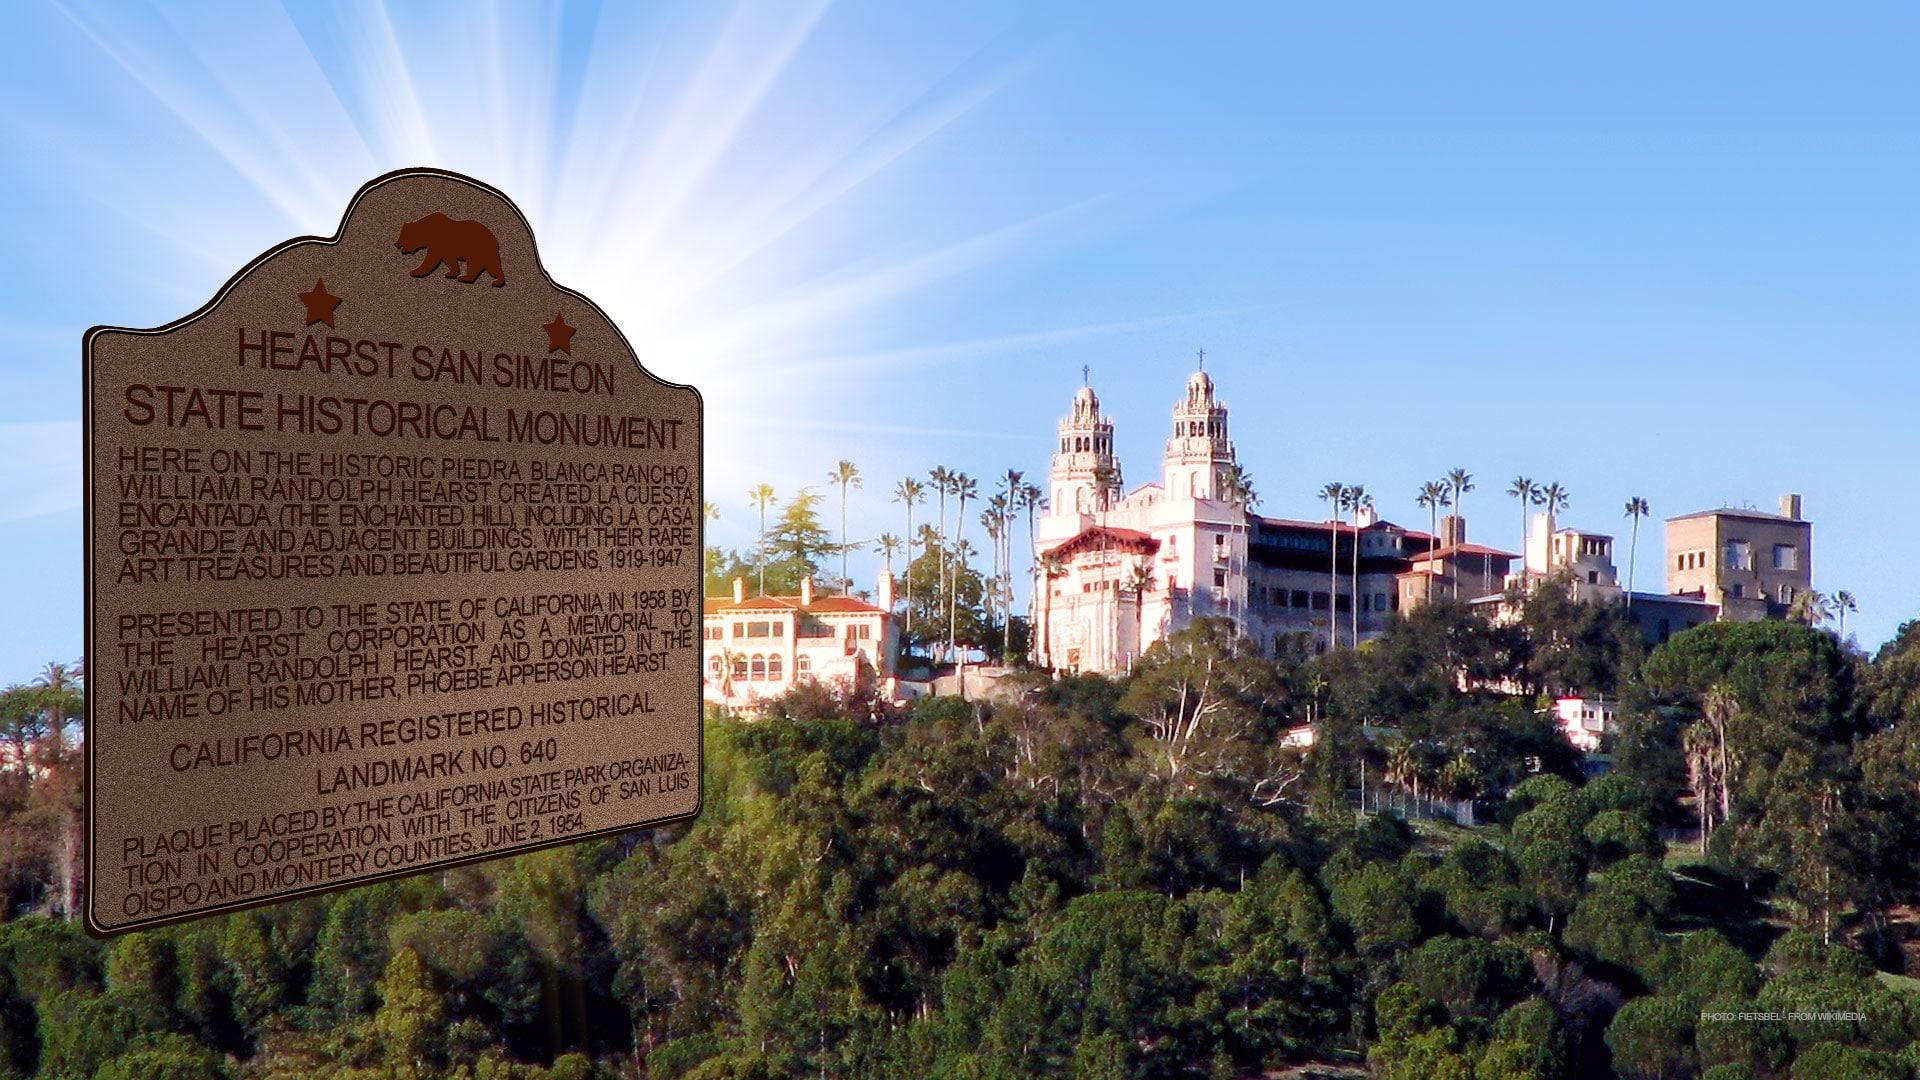 La Cuesta Encantada with Monument 640 - Photo: Fietsbel on Wikimedia